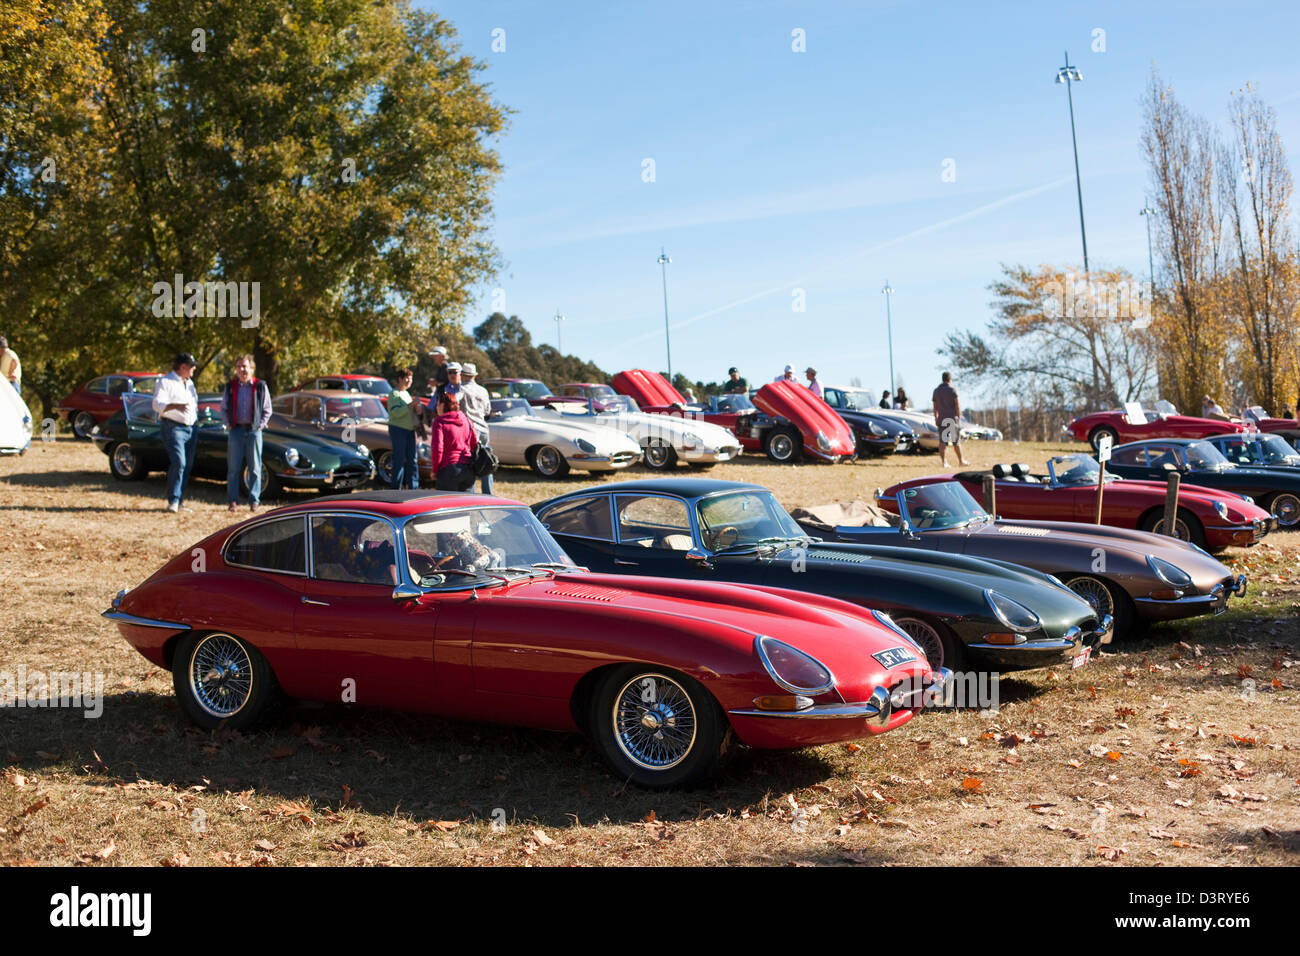 Jaguar Vintage car rally en Parkes. Canberra, Australian Capital Territory (ACT), Australia Imagen De Stock